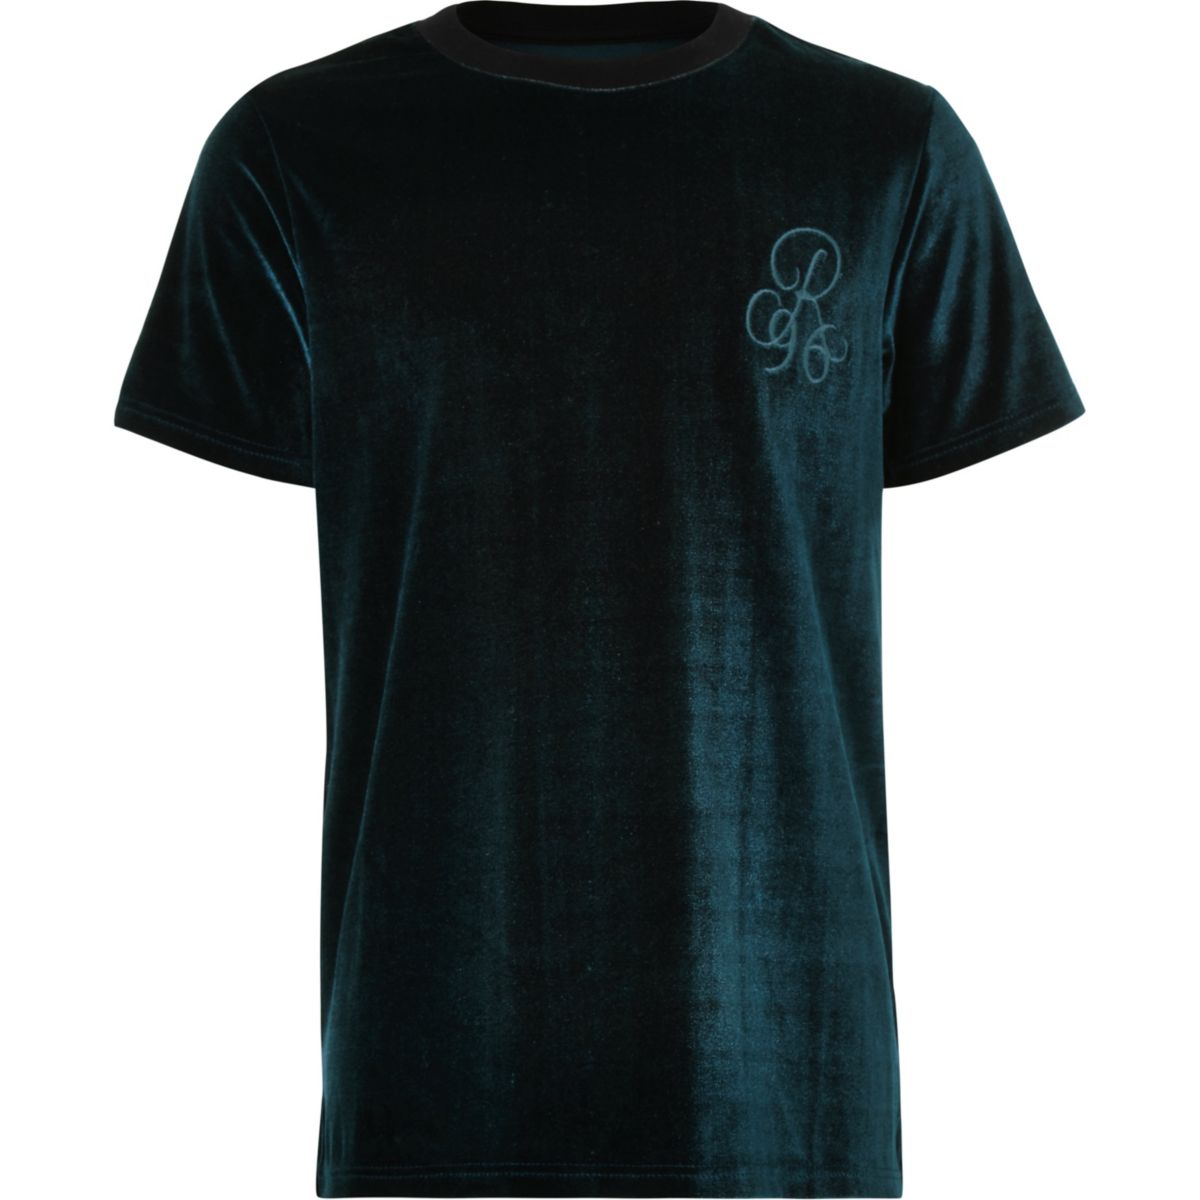 Boys 'R96' blue velour T-shirt